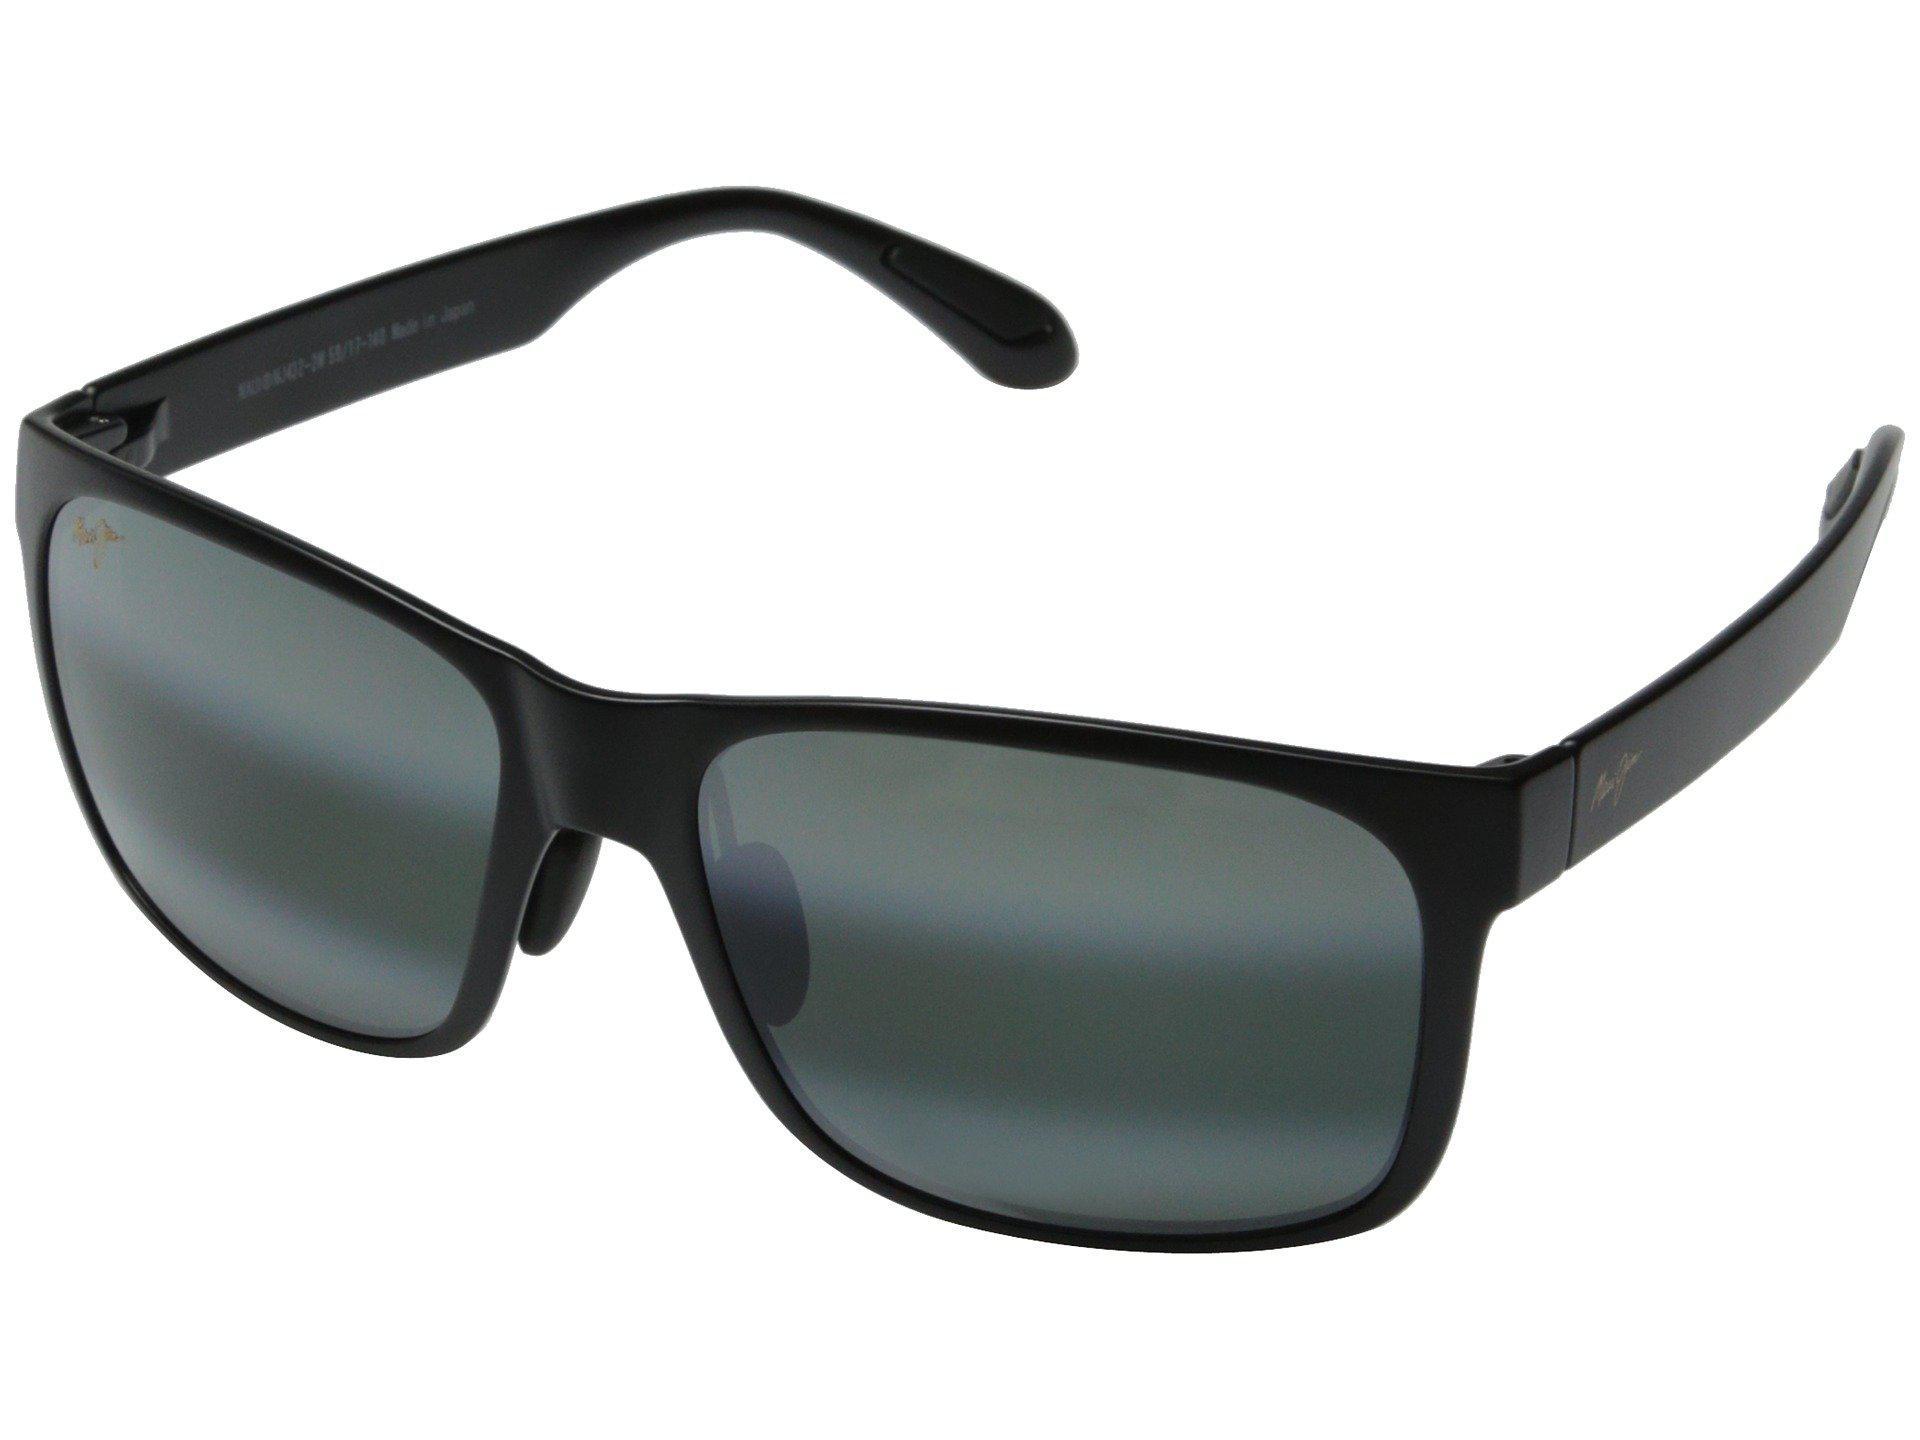 683d84fdfb Maui Jim. Women s Red Sands (black grey Tortoise hcl Bronze) Fashion  Sunglasses